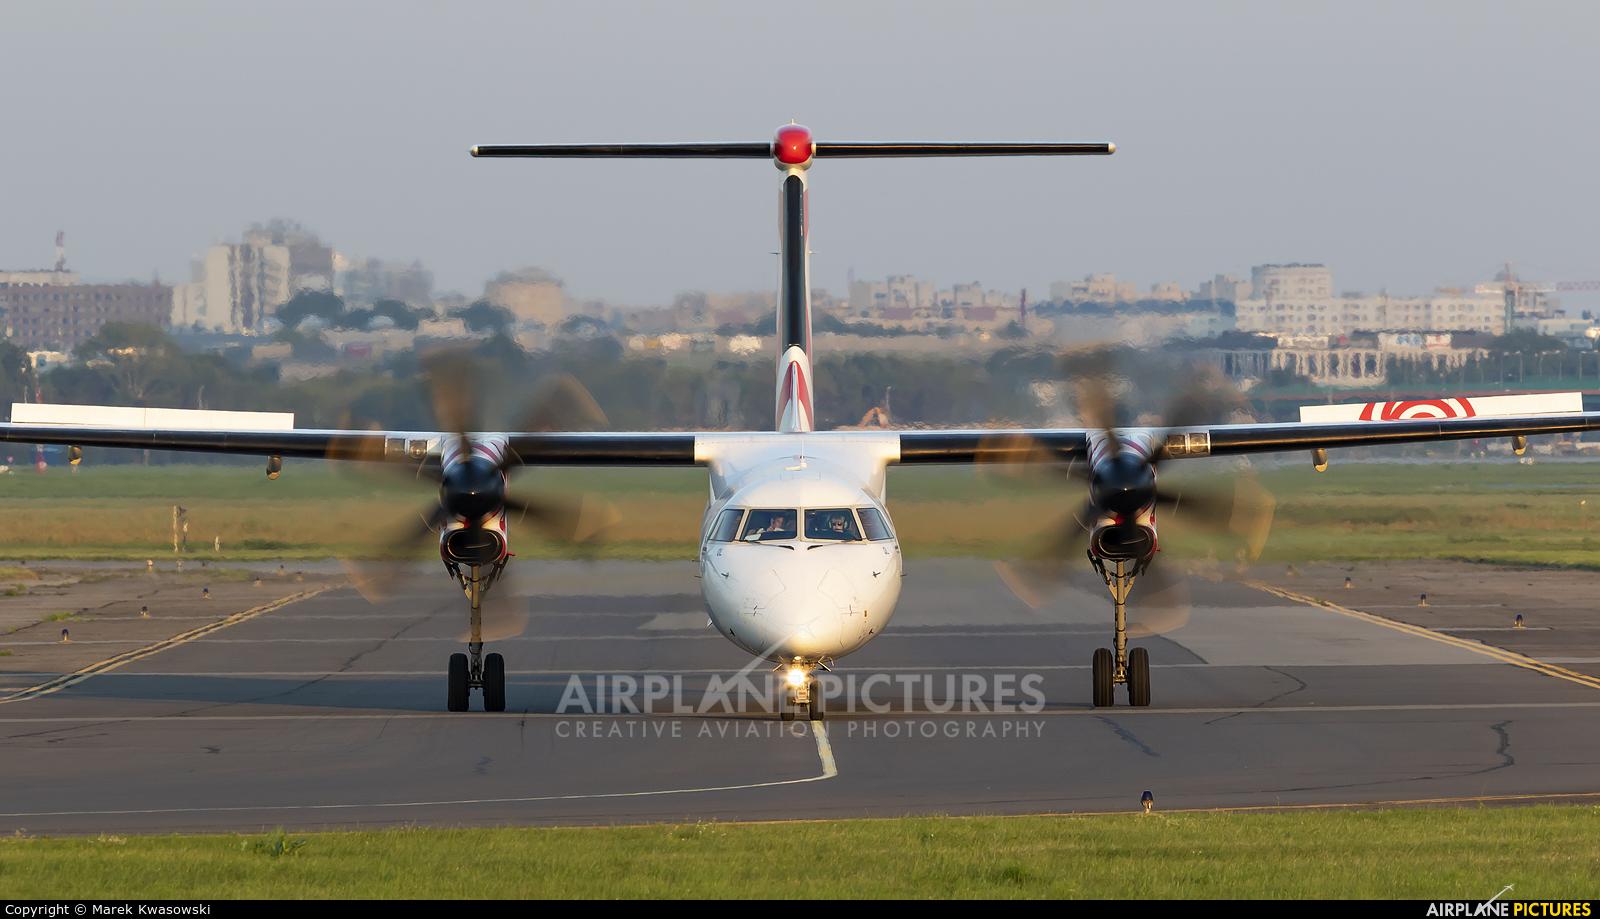 LOT - Polish Airlines SP-EQL aircraft at Warsaw - Frederic Chopin